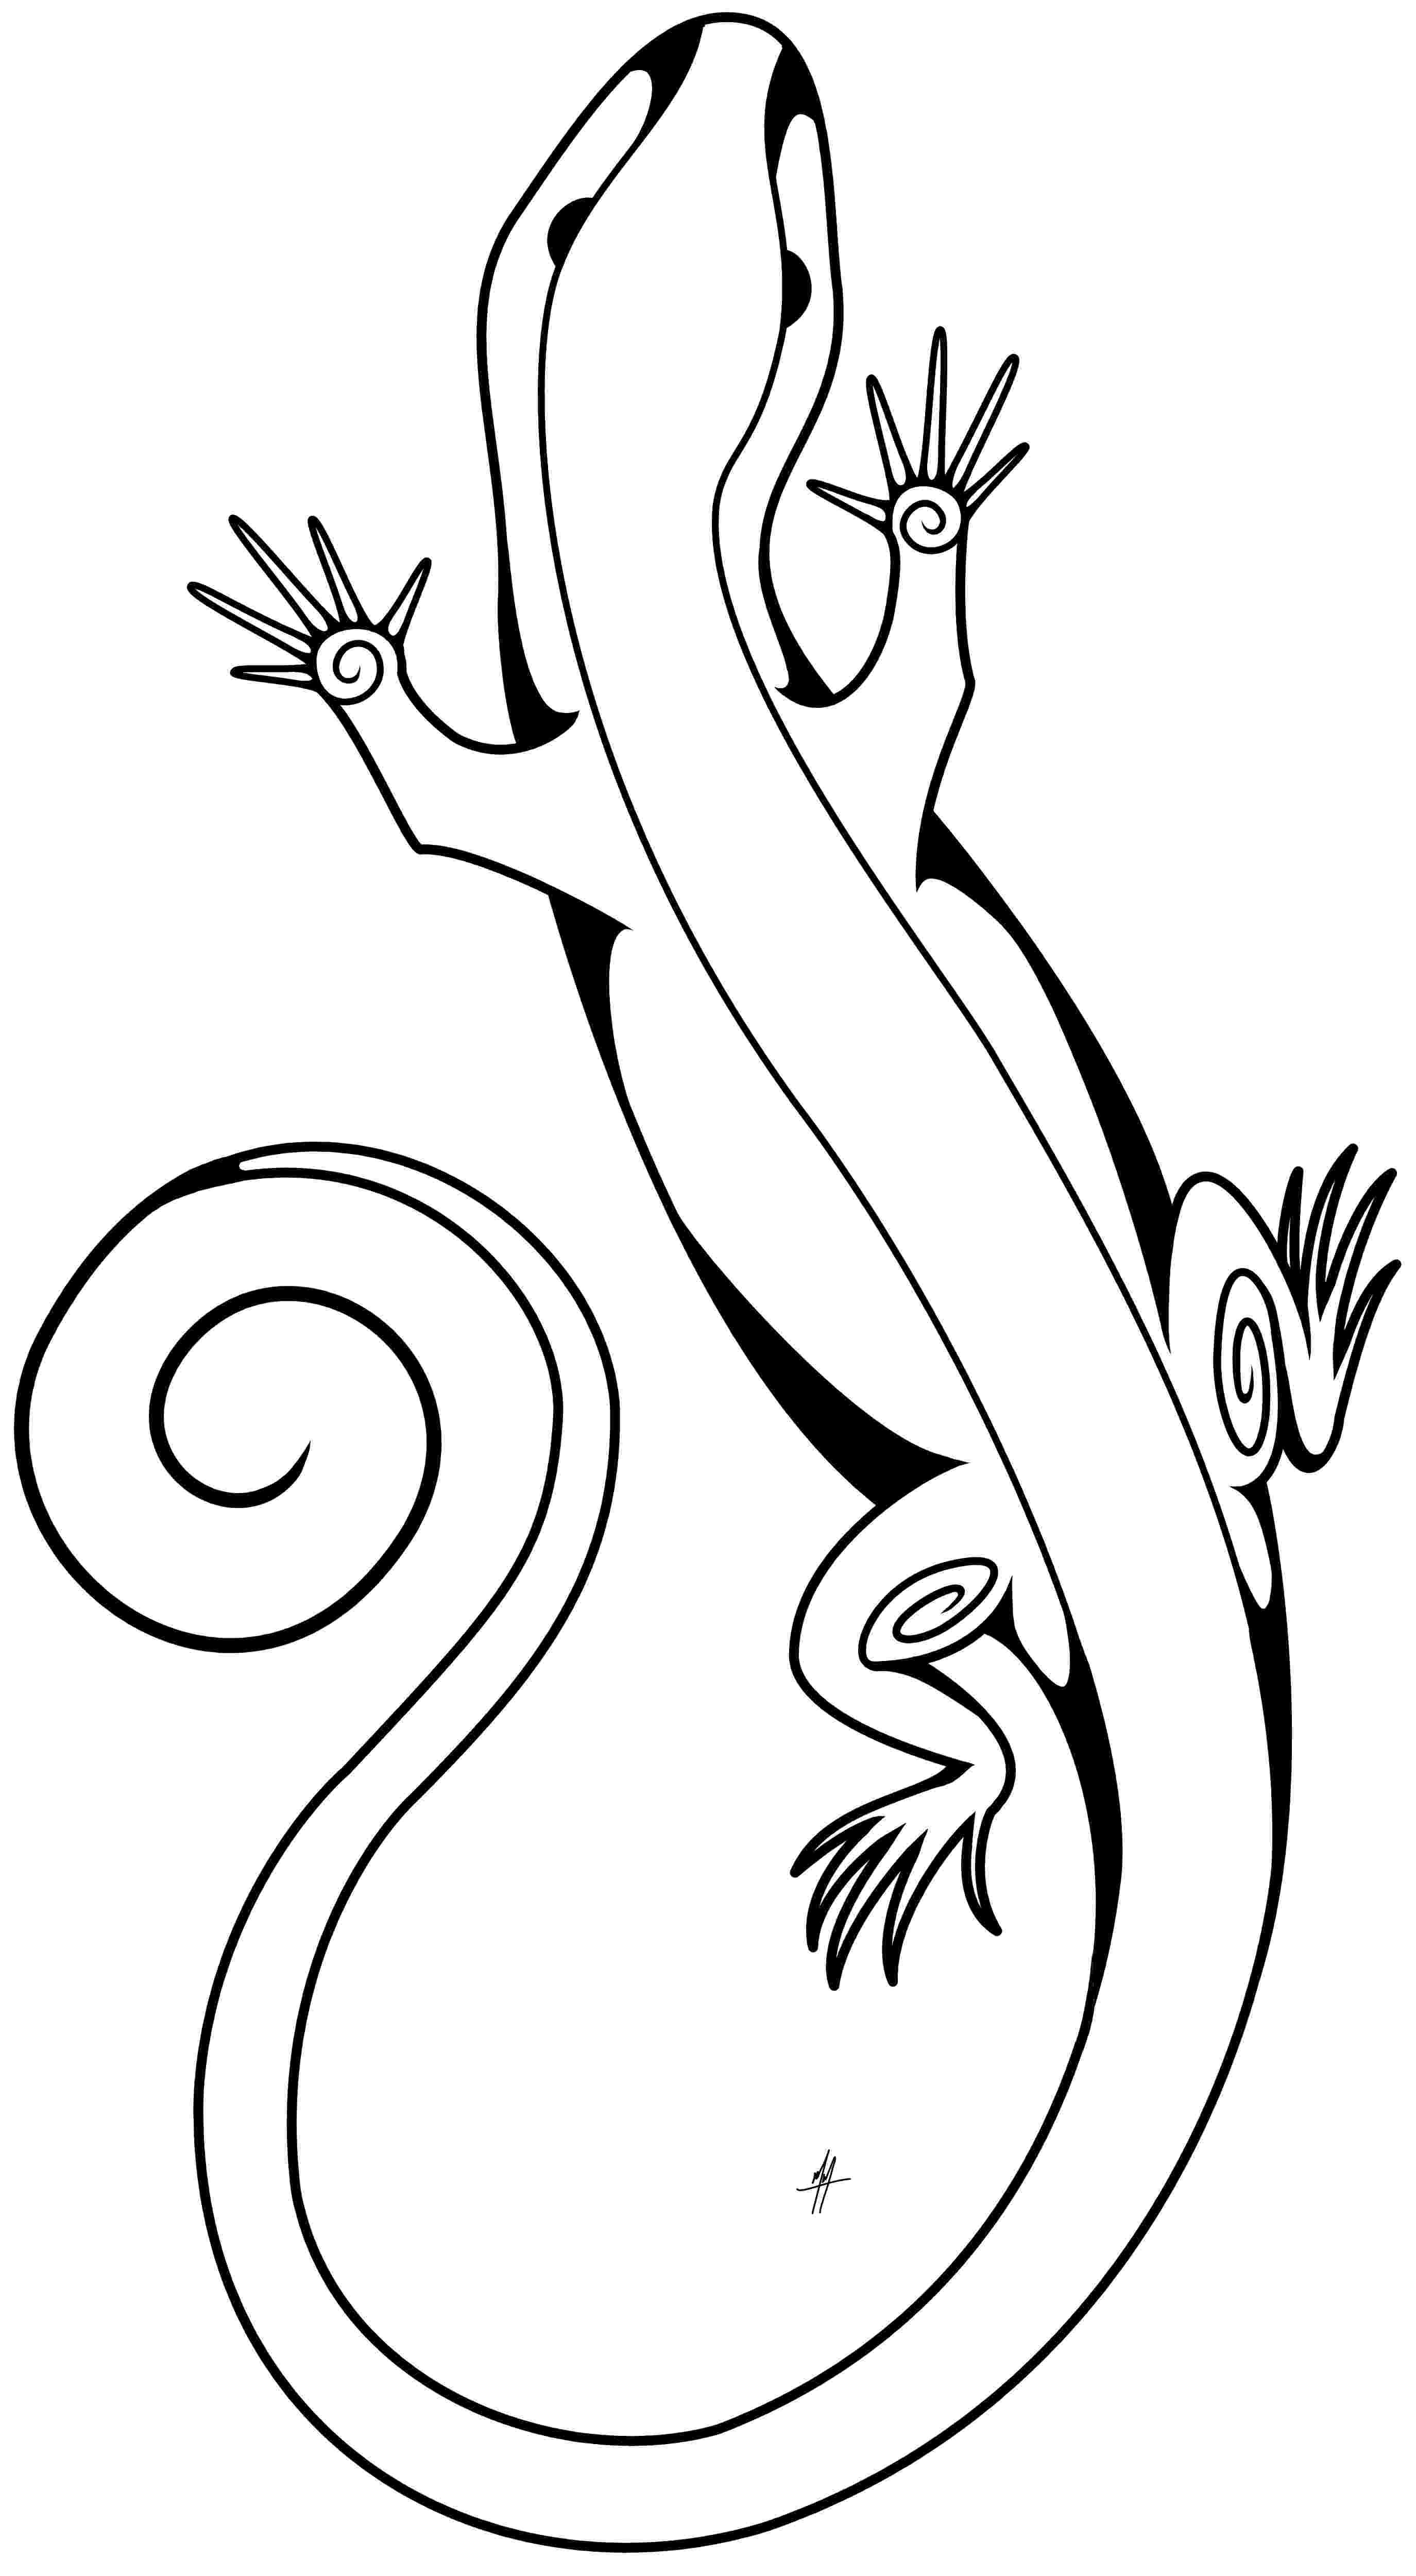 lizard sketch lizard sketch1 by gigglewhatsit on deviantart sketch lizard